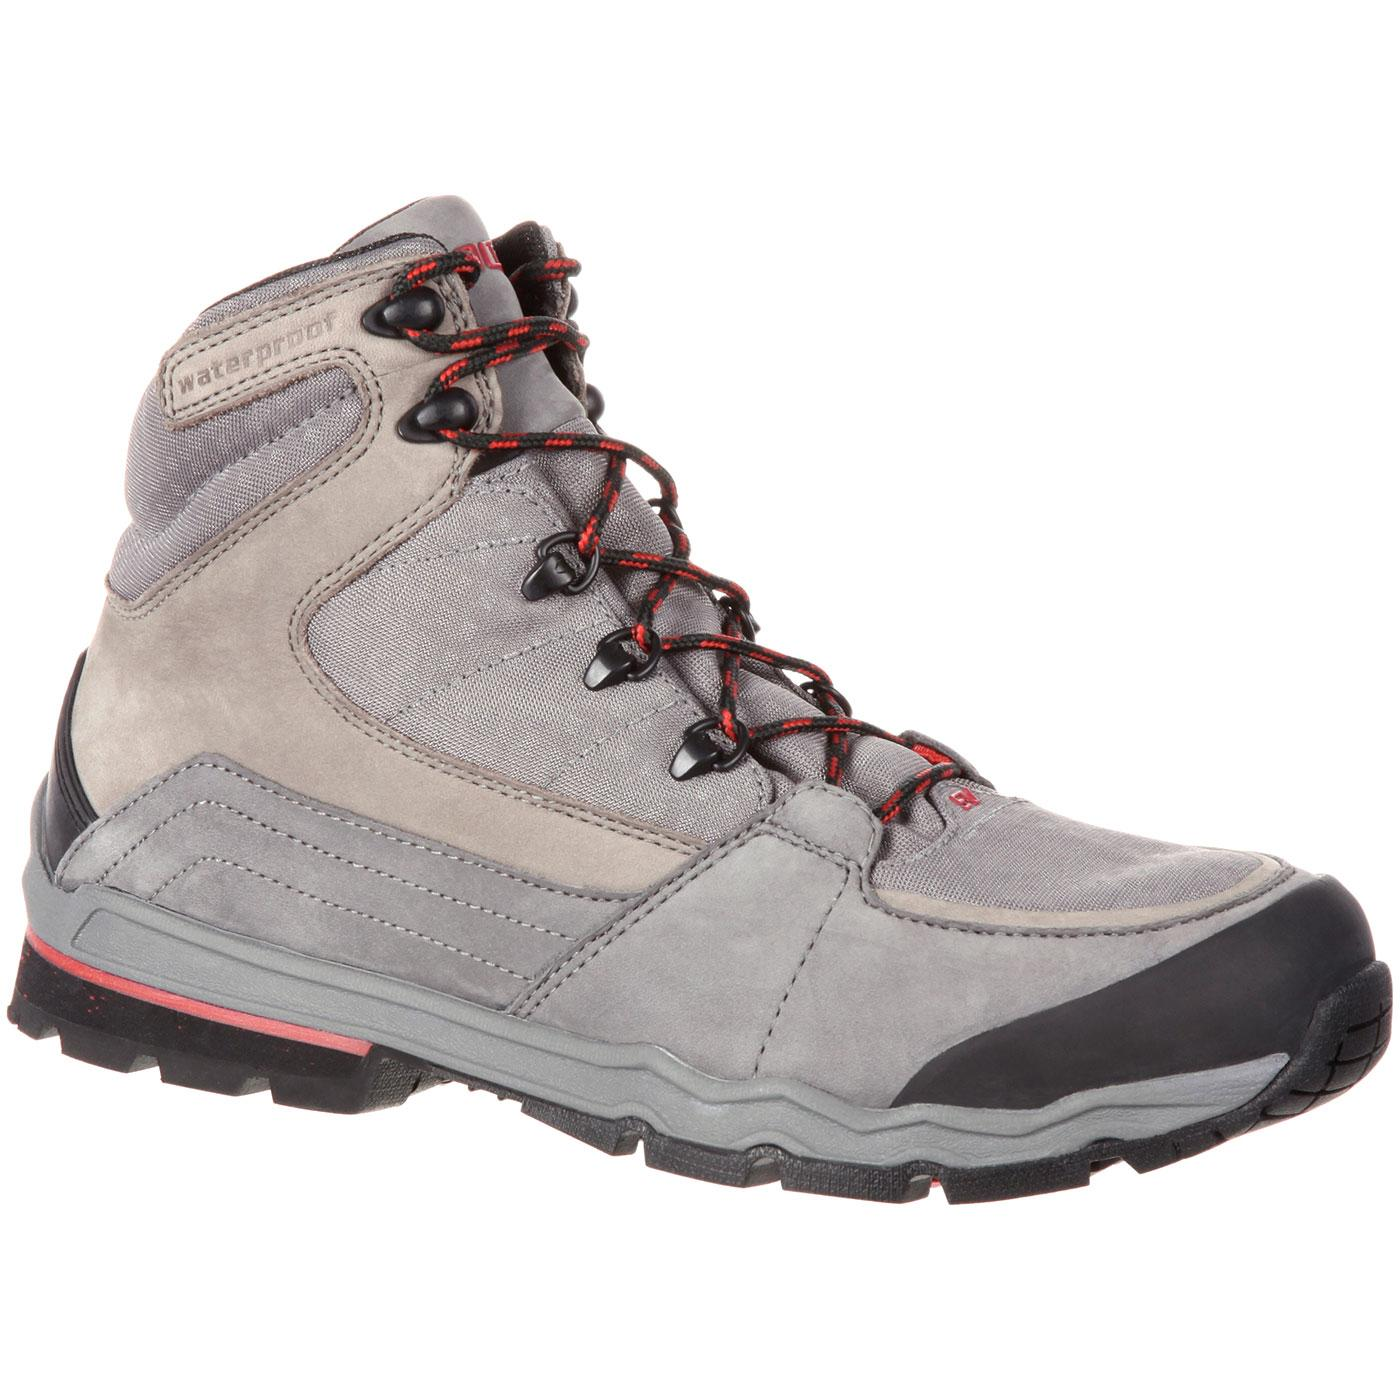 "Men's 5"" S2V Extreme Waterproof Hiker-RKE0034"